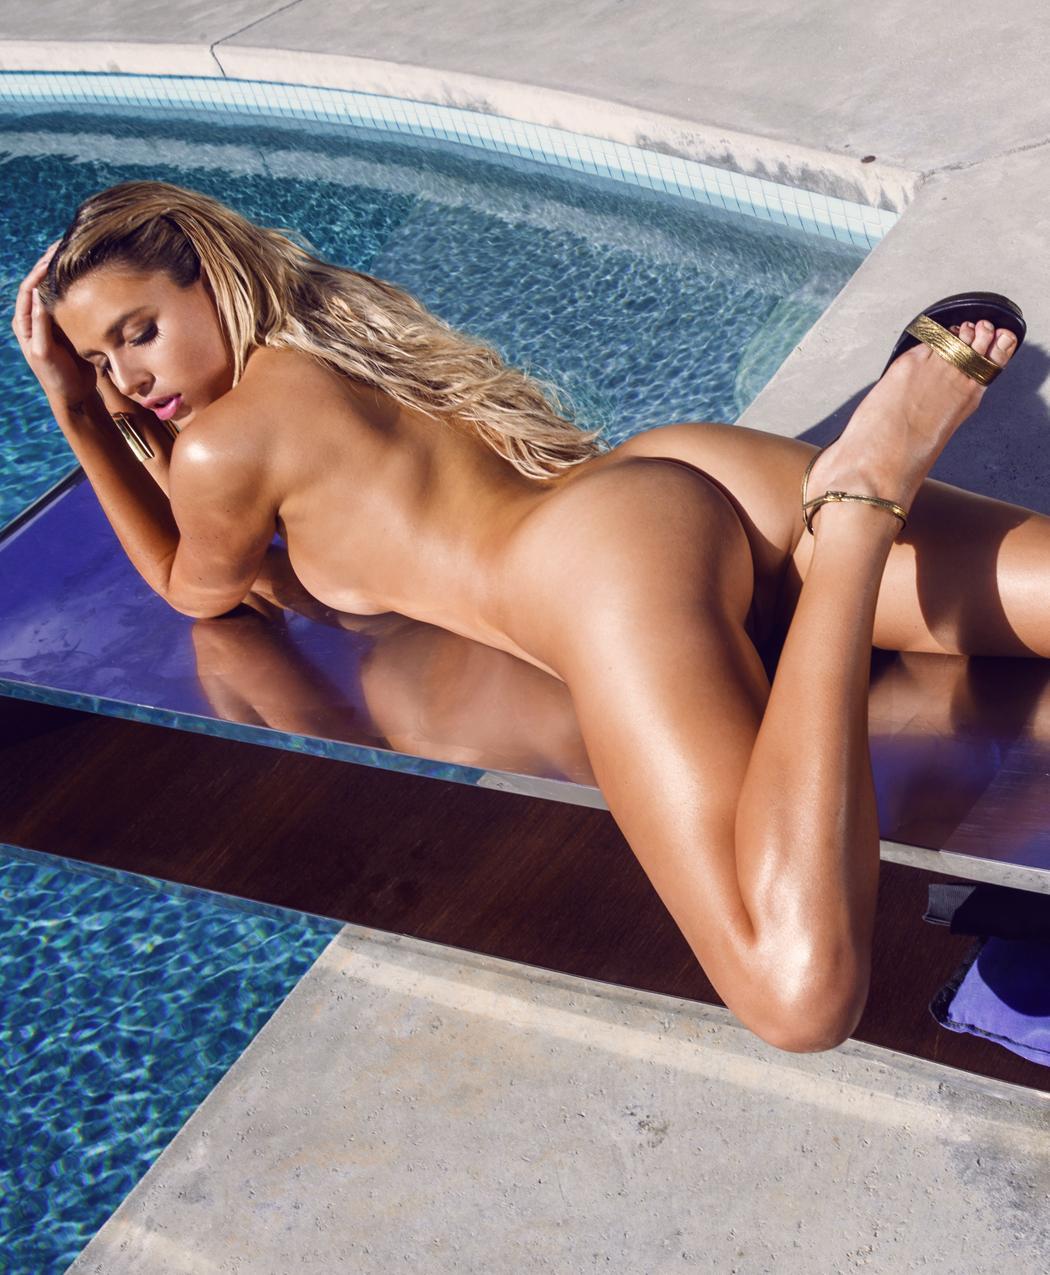 hot sims girls naked